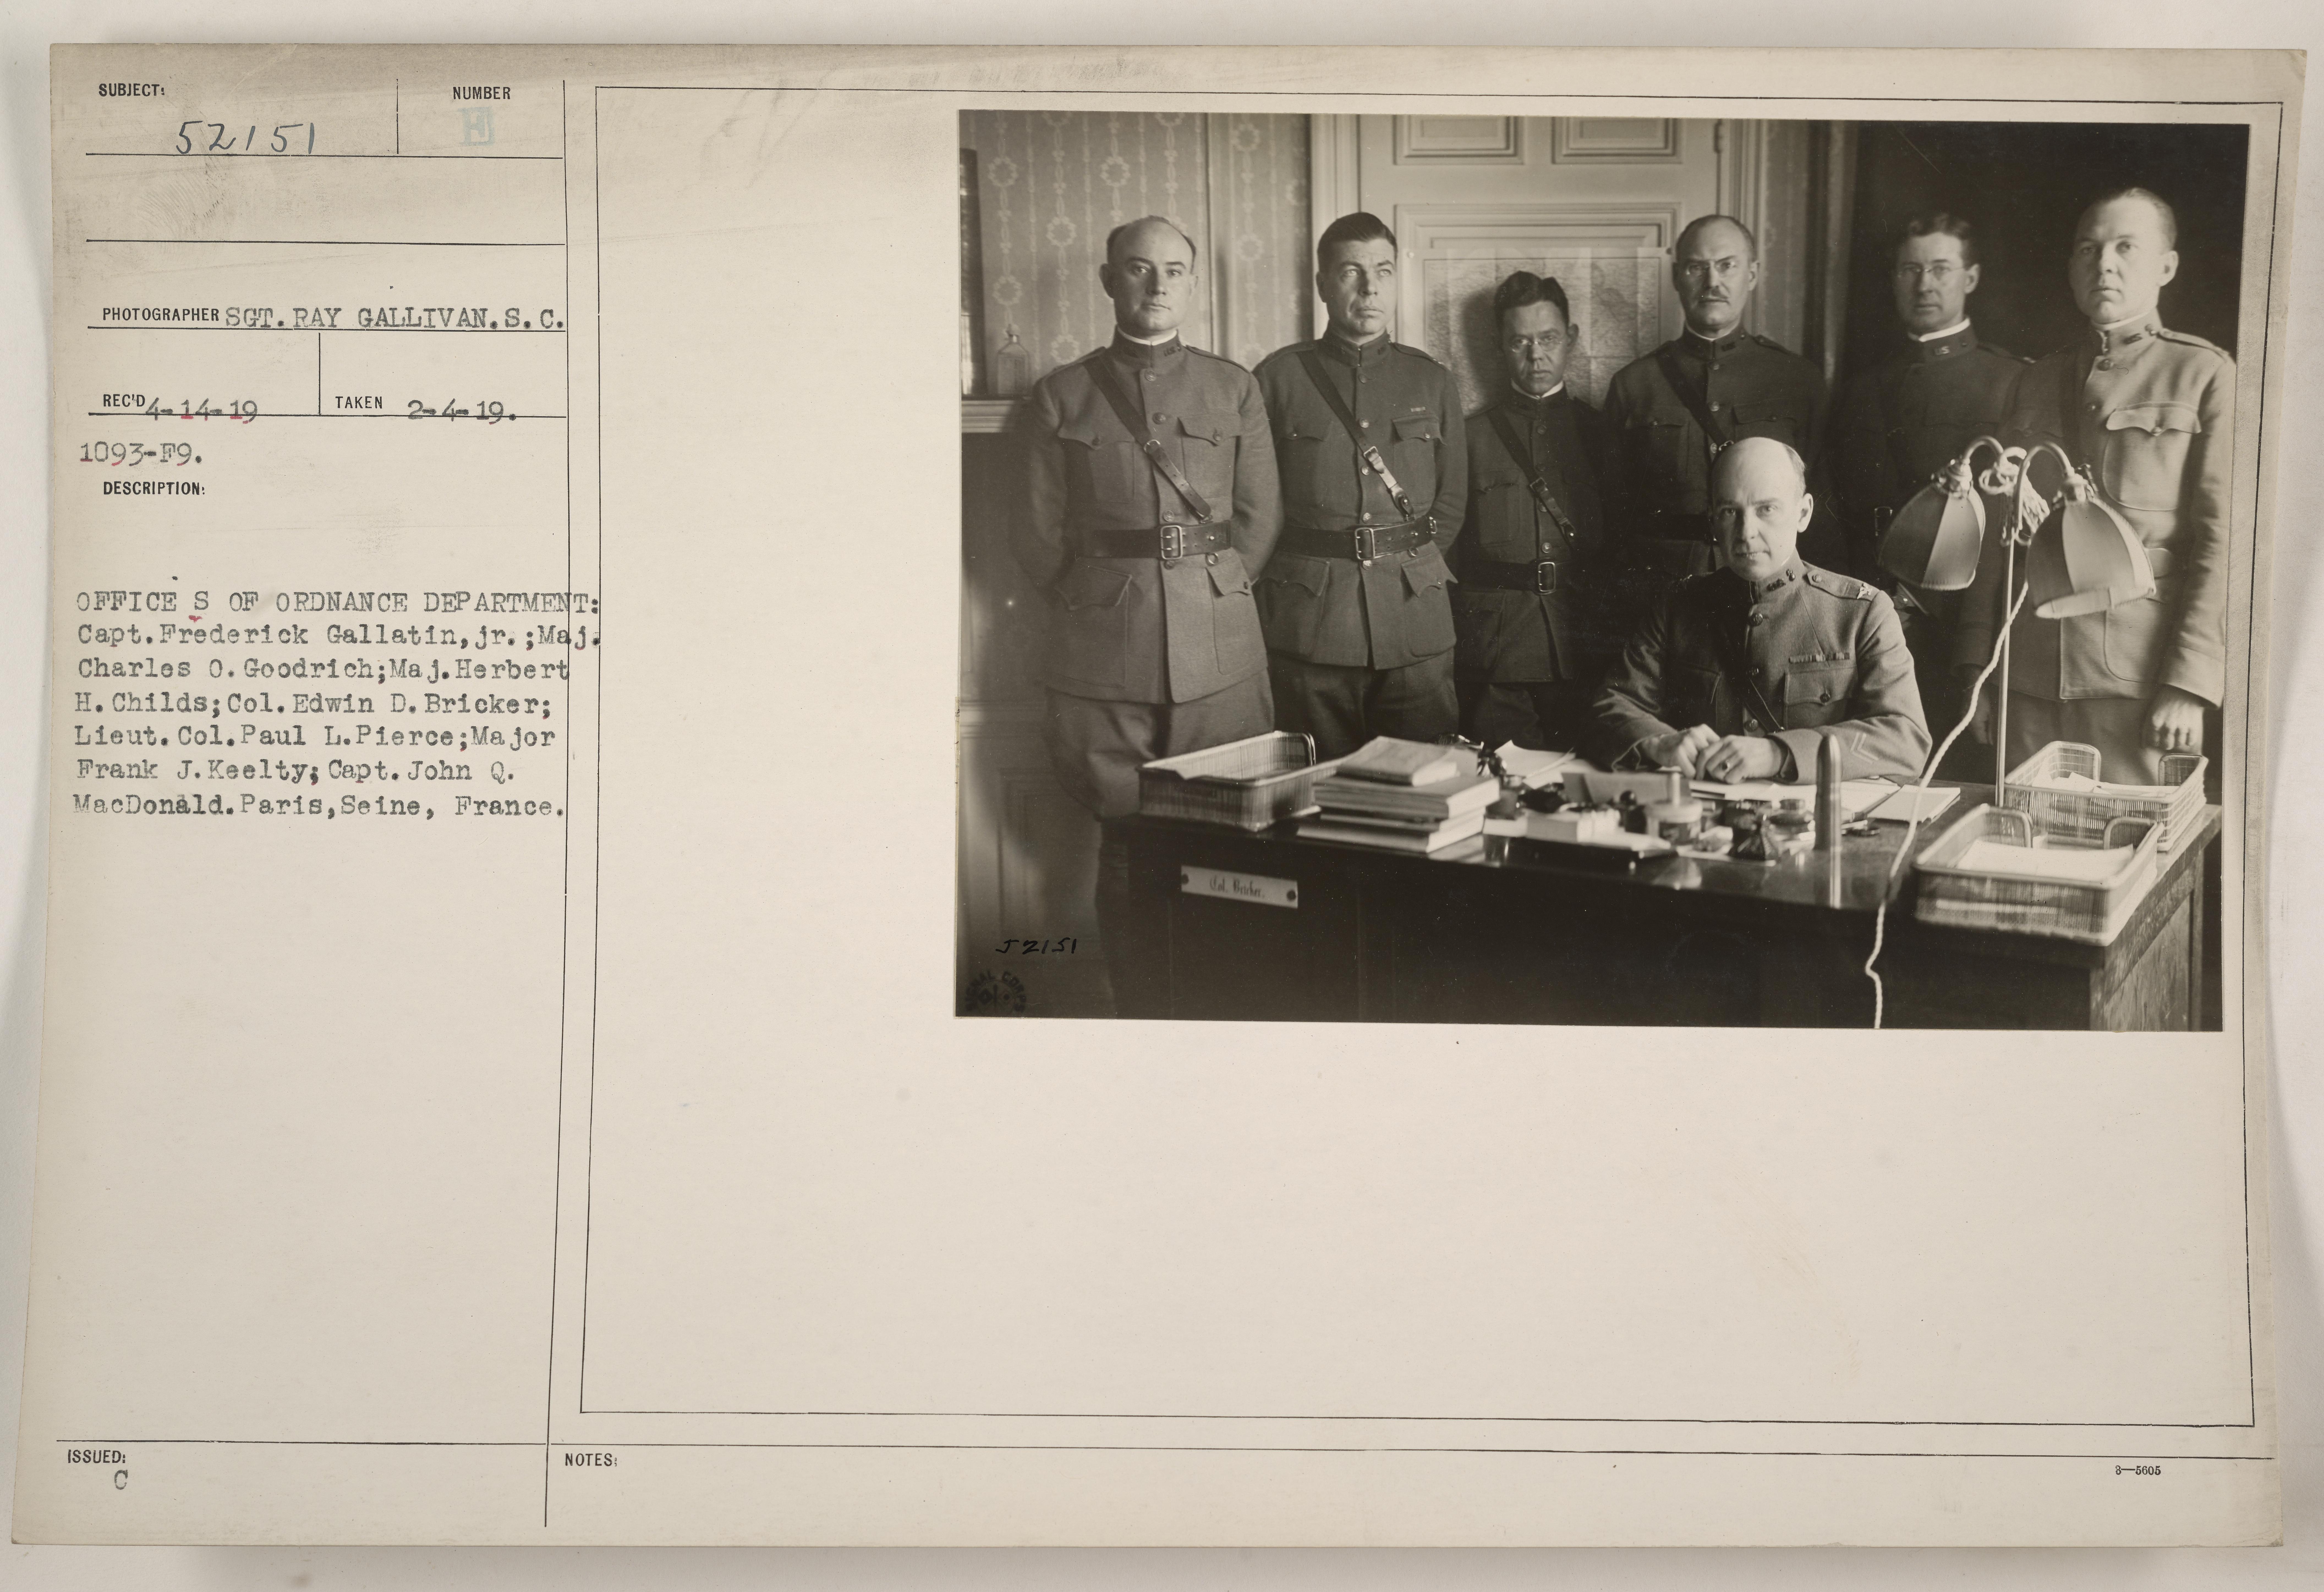 Officers of Ordnance Department (names in caption). Paris, Seine, France